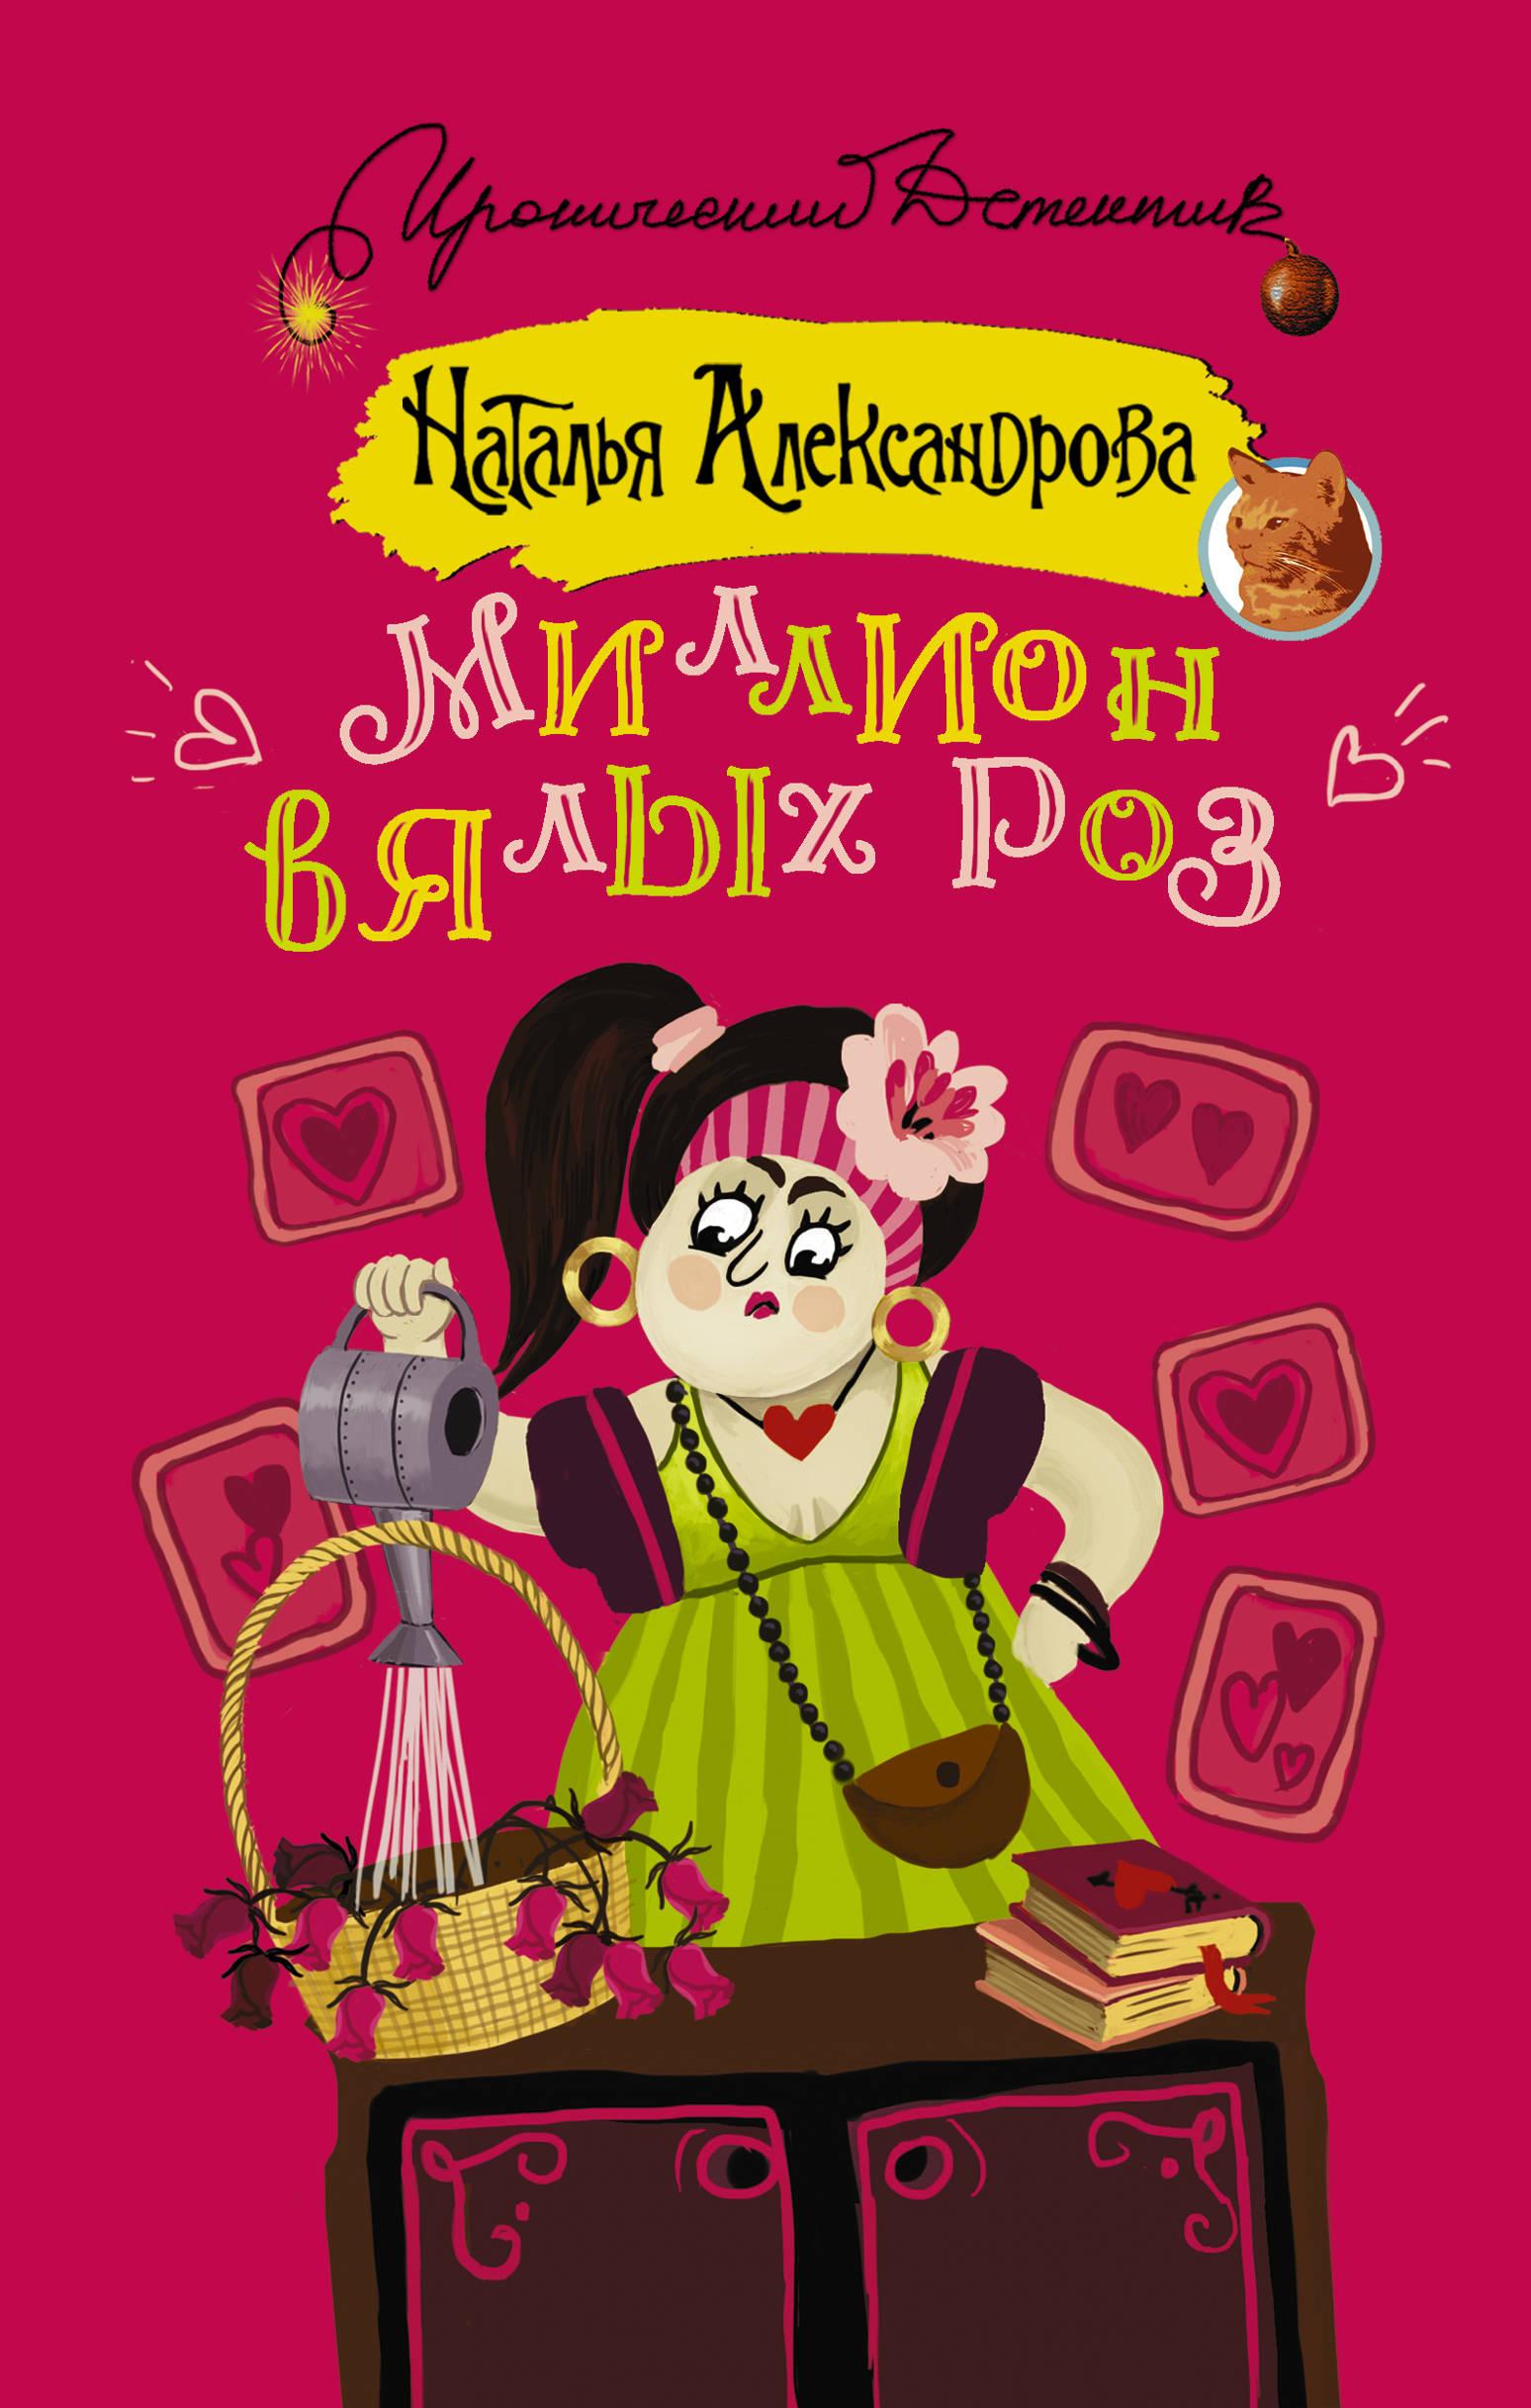 Наталья Александрова Миллион вялых роз ISBN: 978-5-17-106716-8